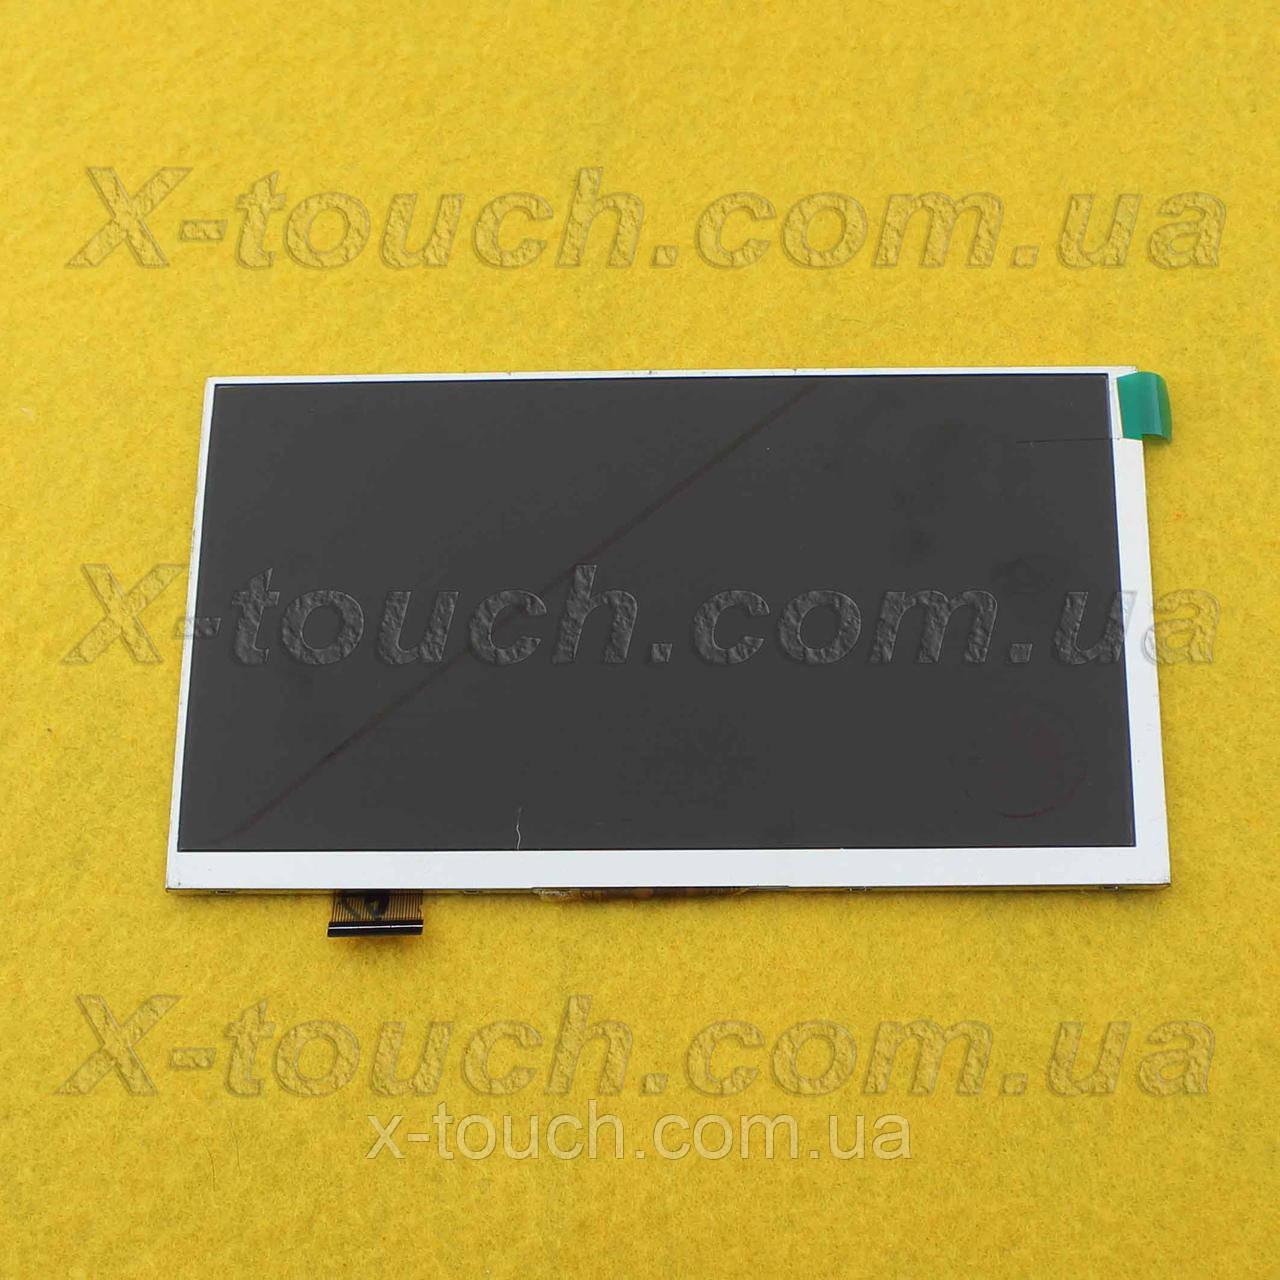 Матриця,екран, дисплей AP070-FPC-30PIN для планшета